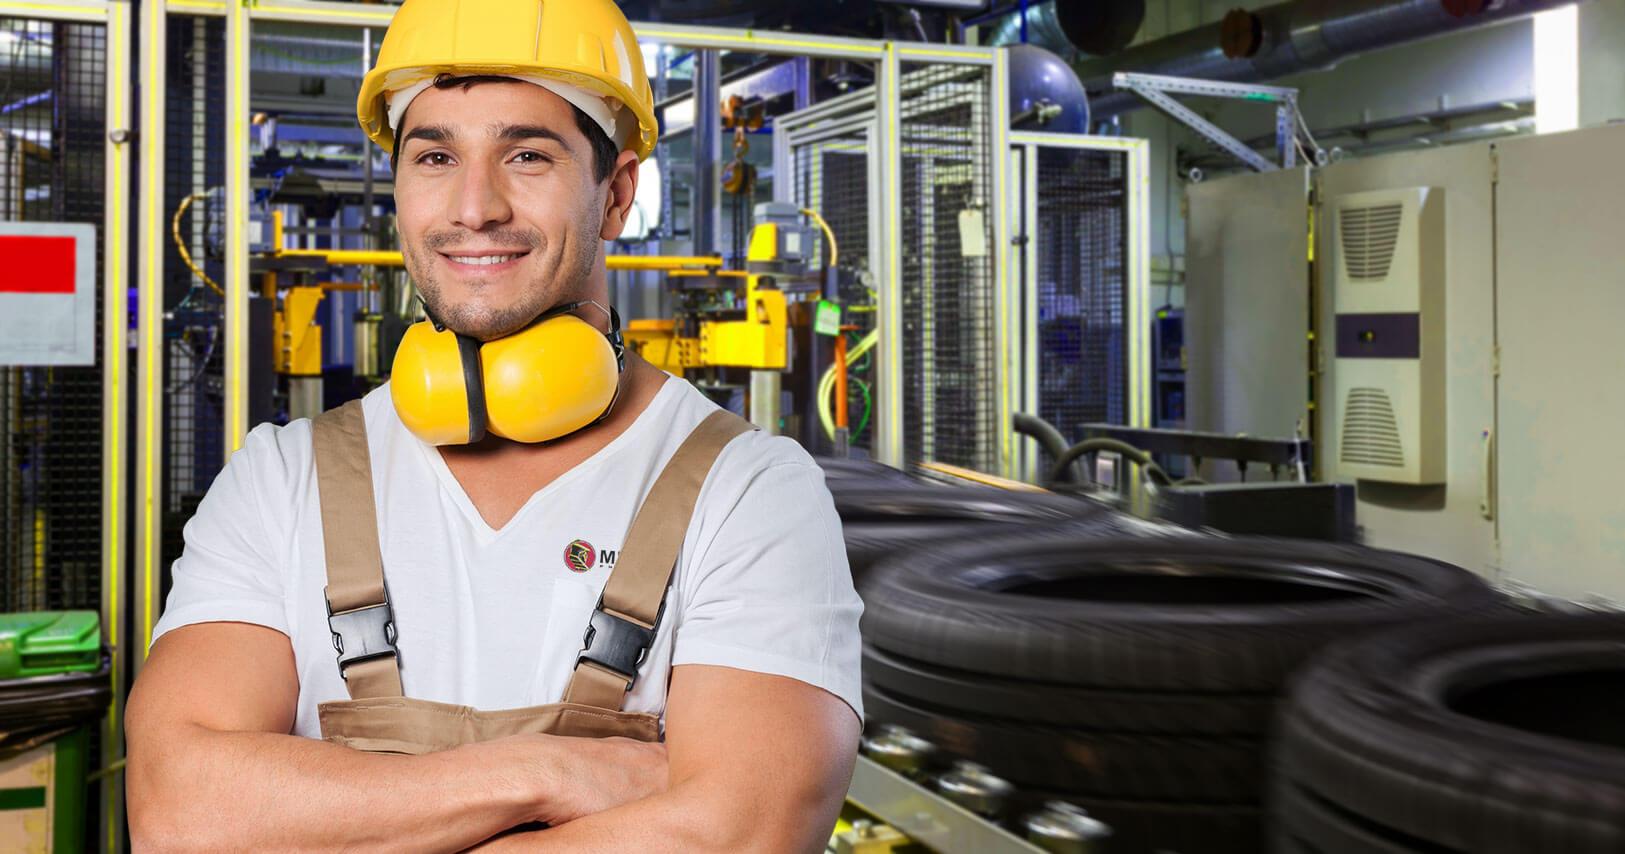 Worker in Tire Factory